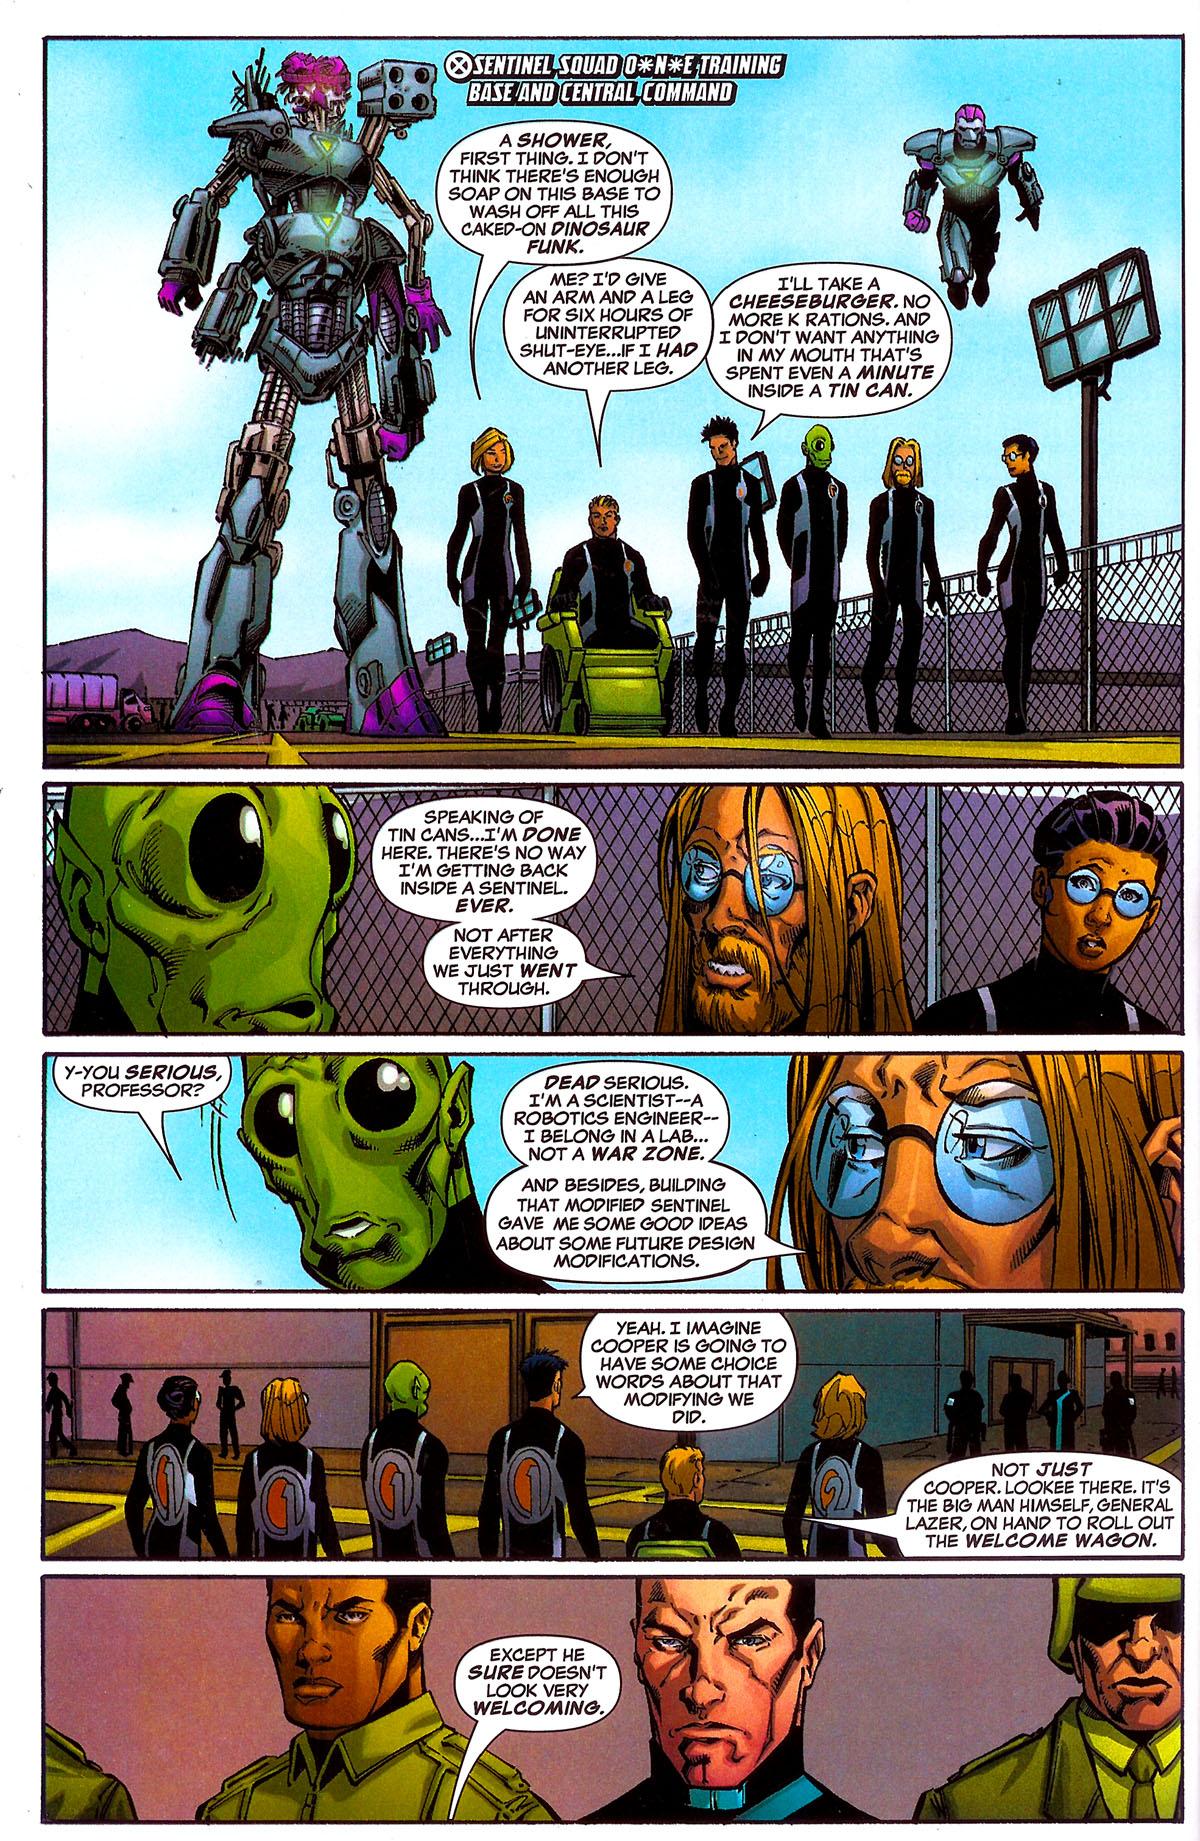 Read online Sentinel Squad O*N*E comic -  Issue #5 - 3